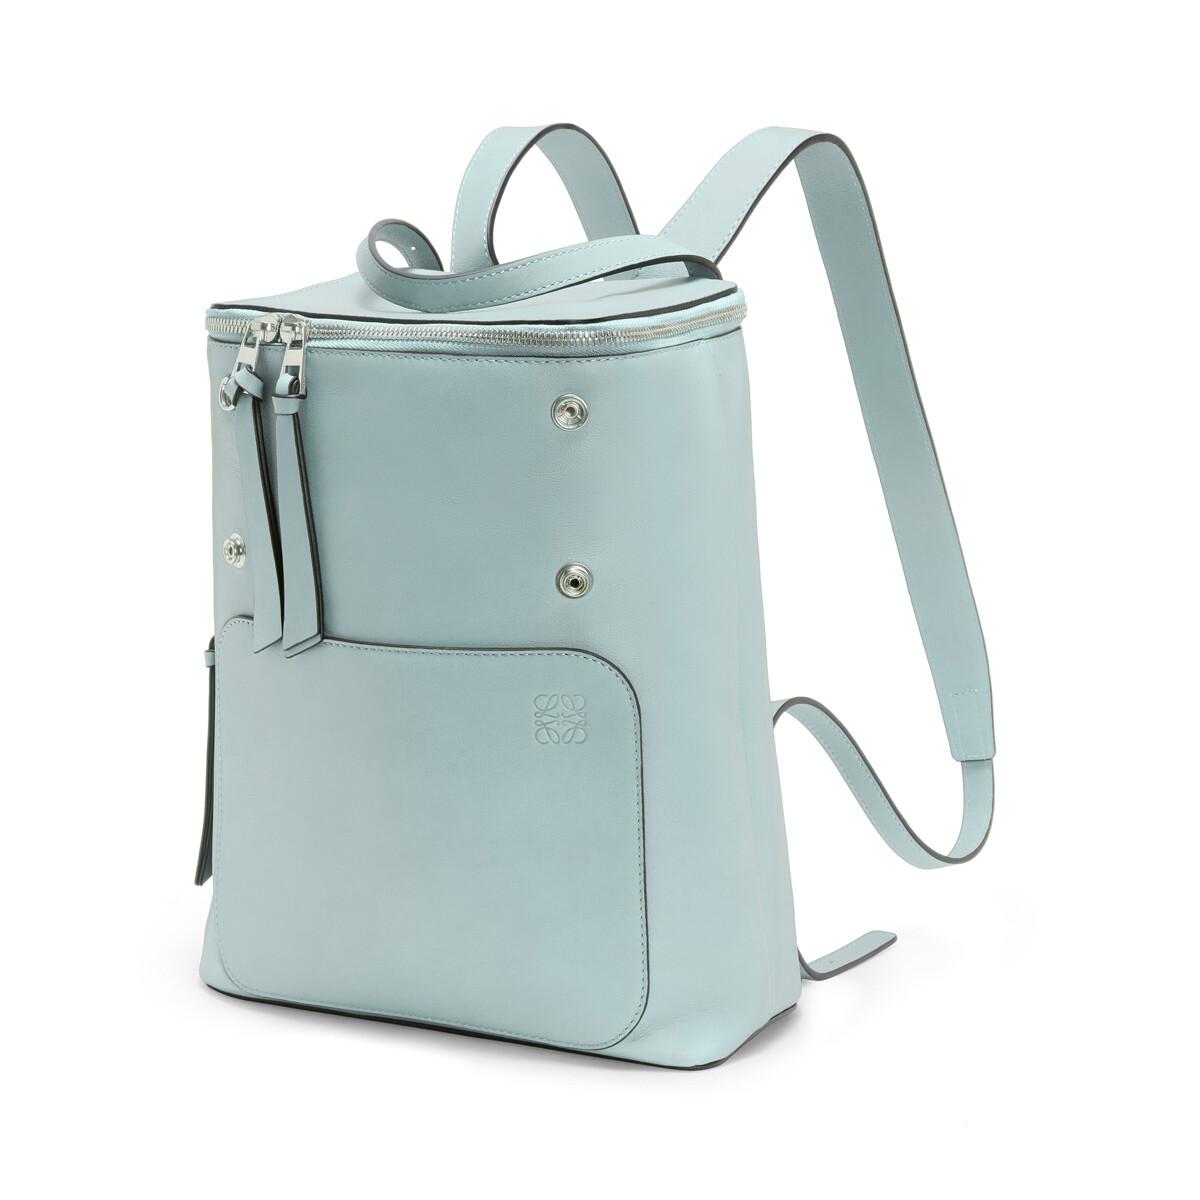 LOEWE Goya Small Backpack Aqua front